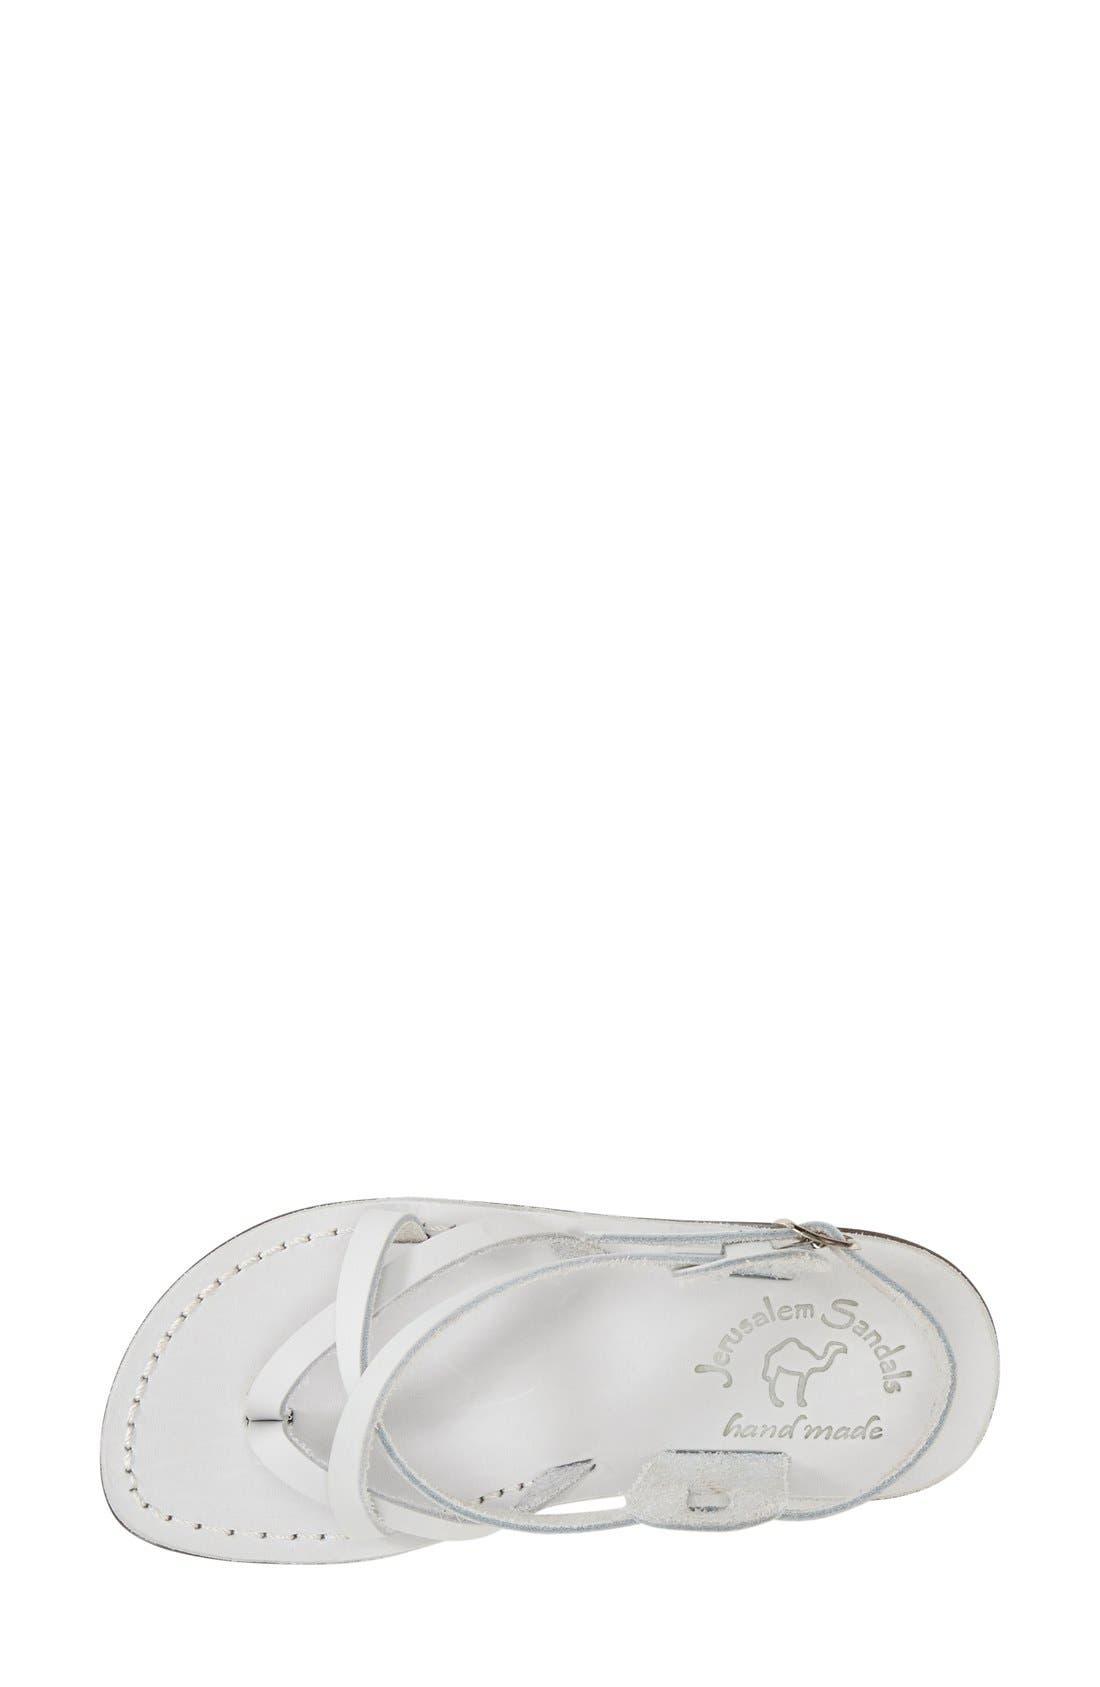 'Tamar' Strappy Sandal,                             Alternate thumbnail 3, color,                             White Leather